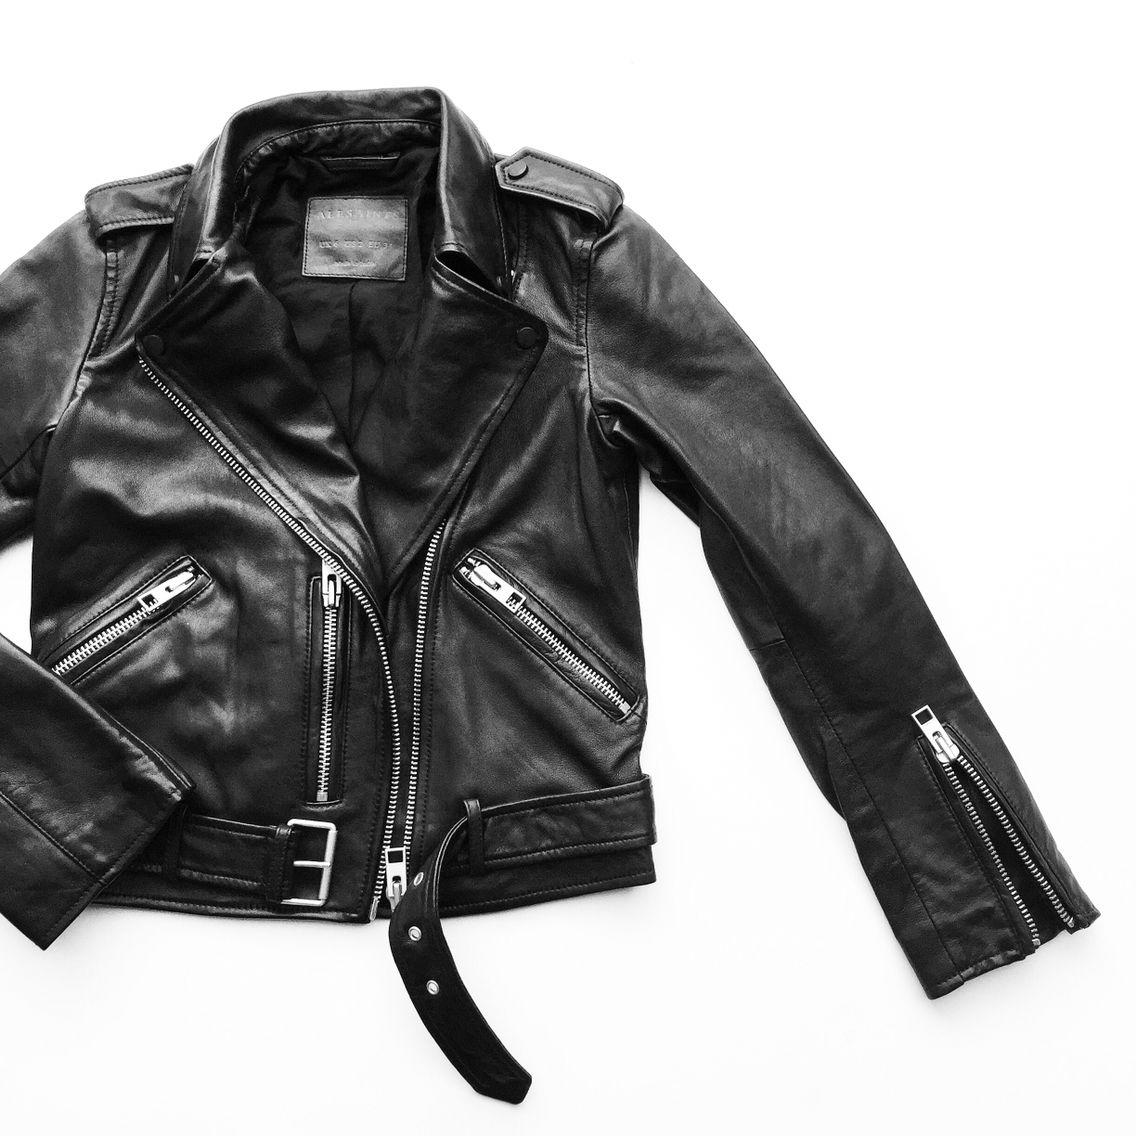 84eeeff83bf3 All Saints Leather Jacket. Flat lay - OVRSLO